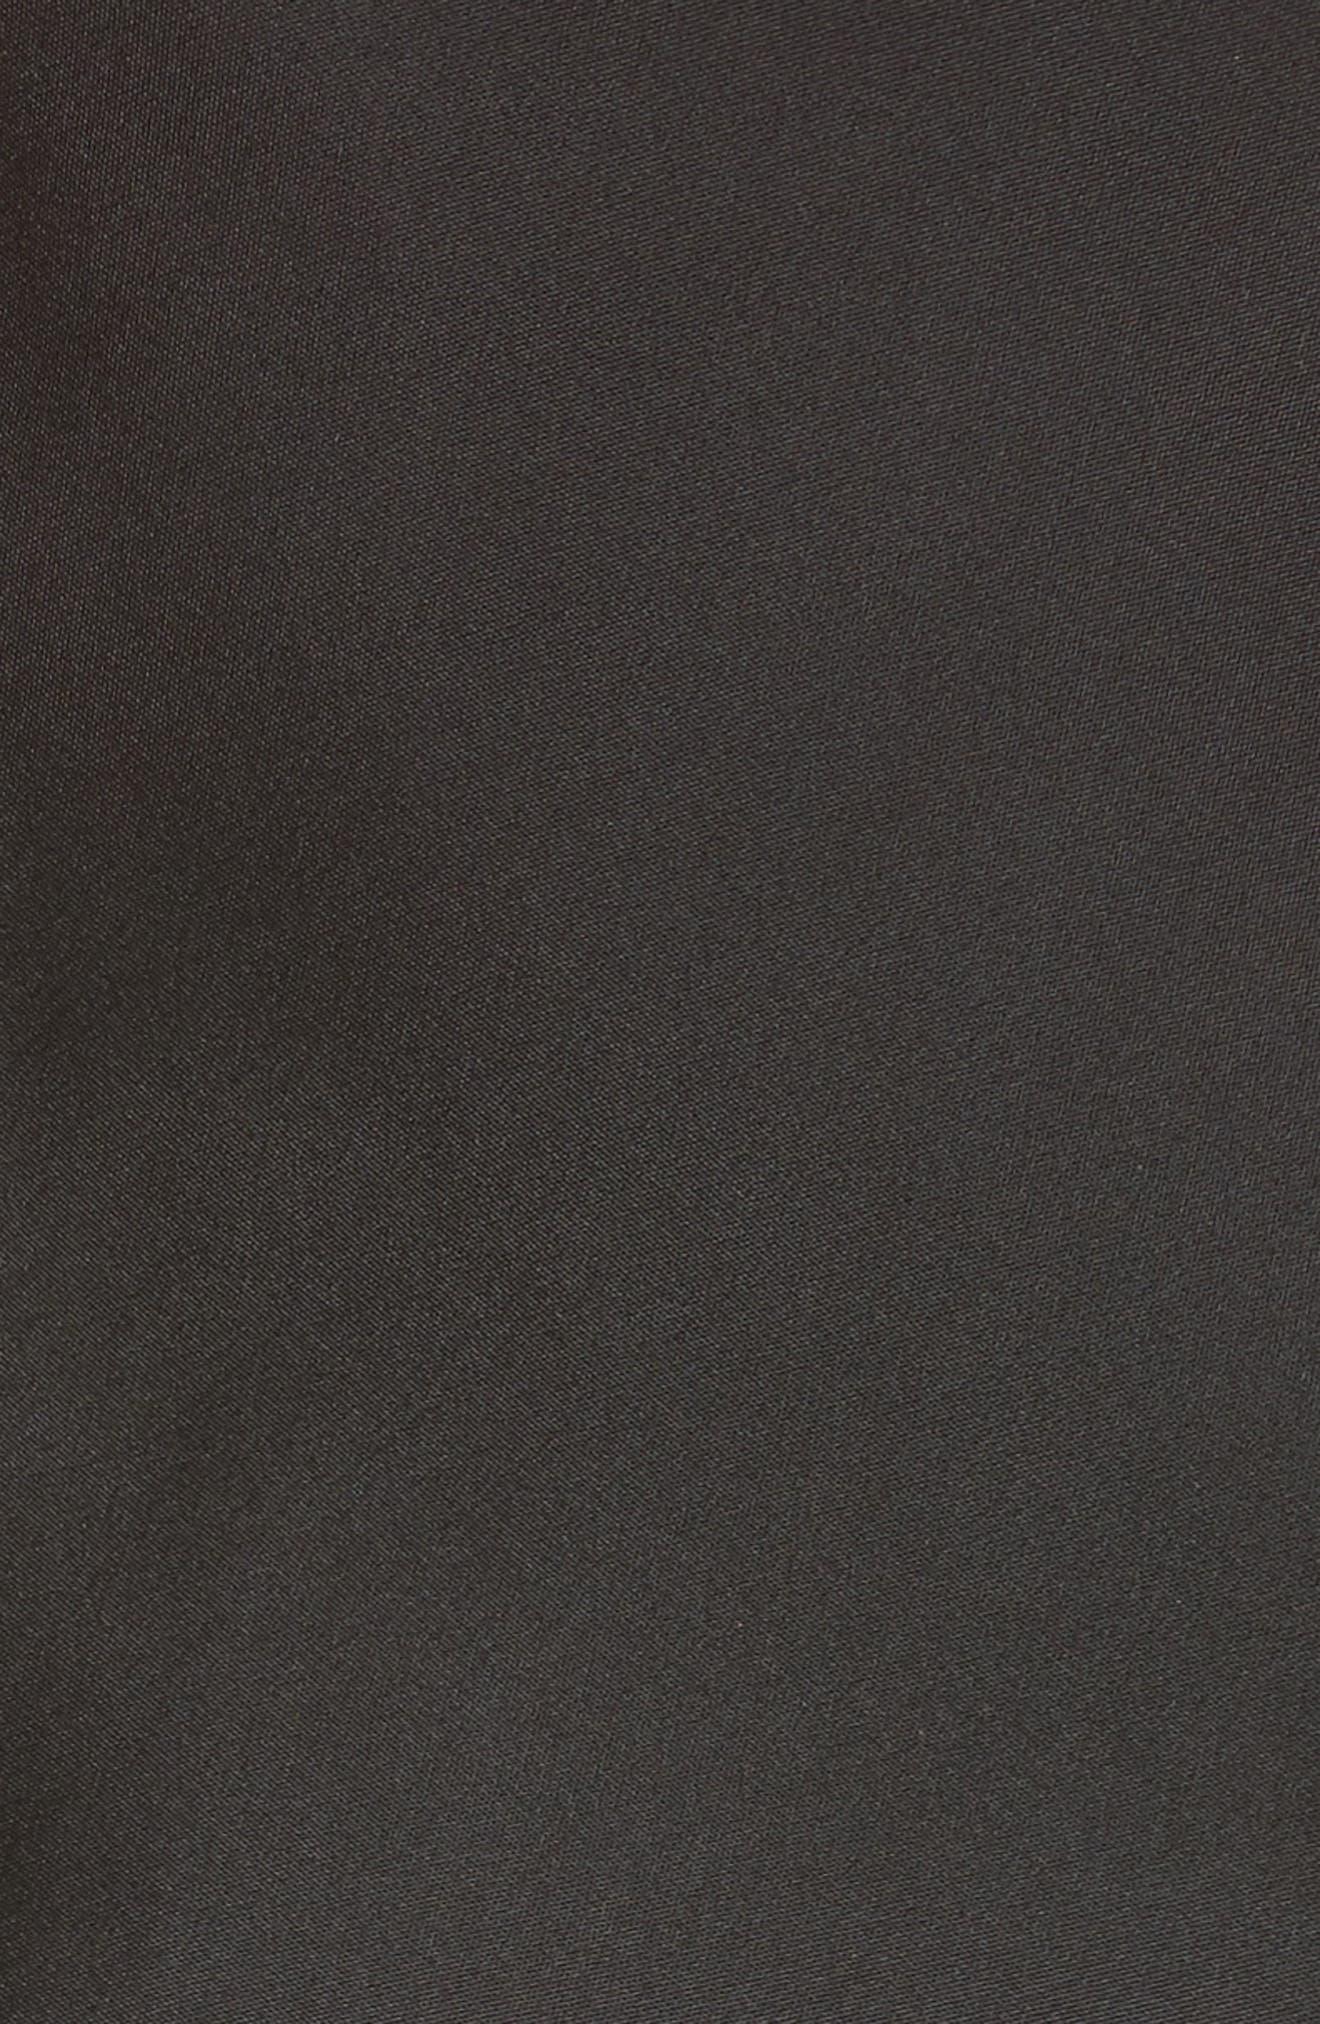 Satin Cowl Neck Halter Top,                             Alternate thumbnail 5, color,                             001